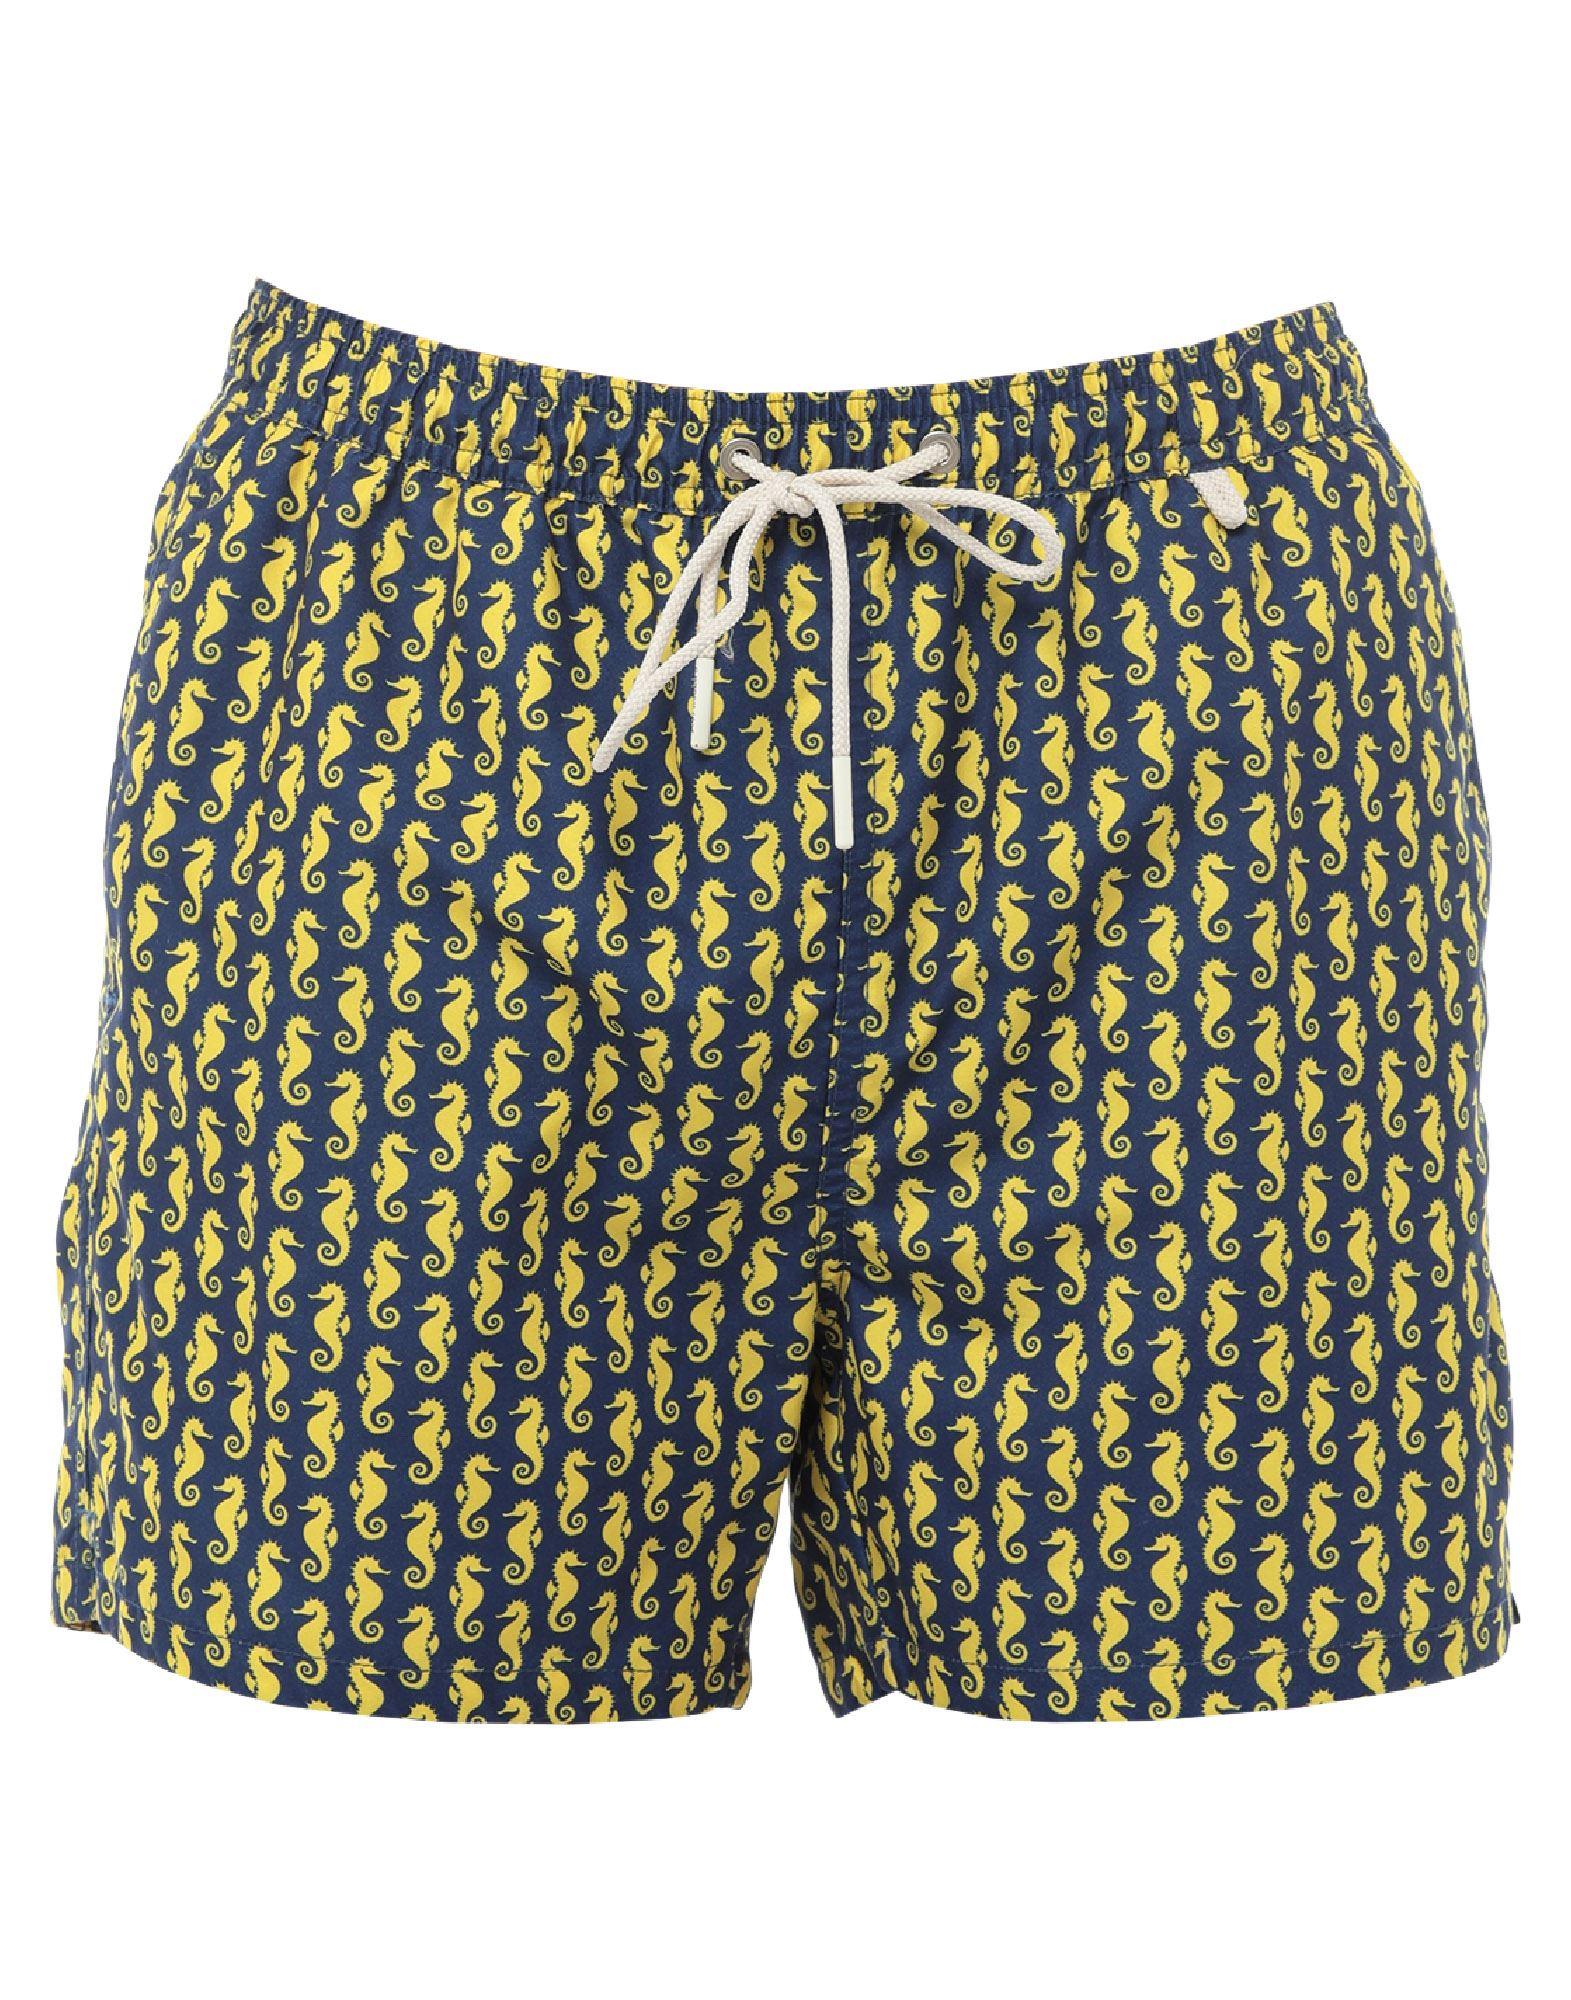 ROŸ ROGER'S Swim trunks - Item 47274776